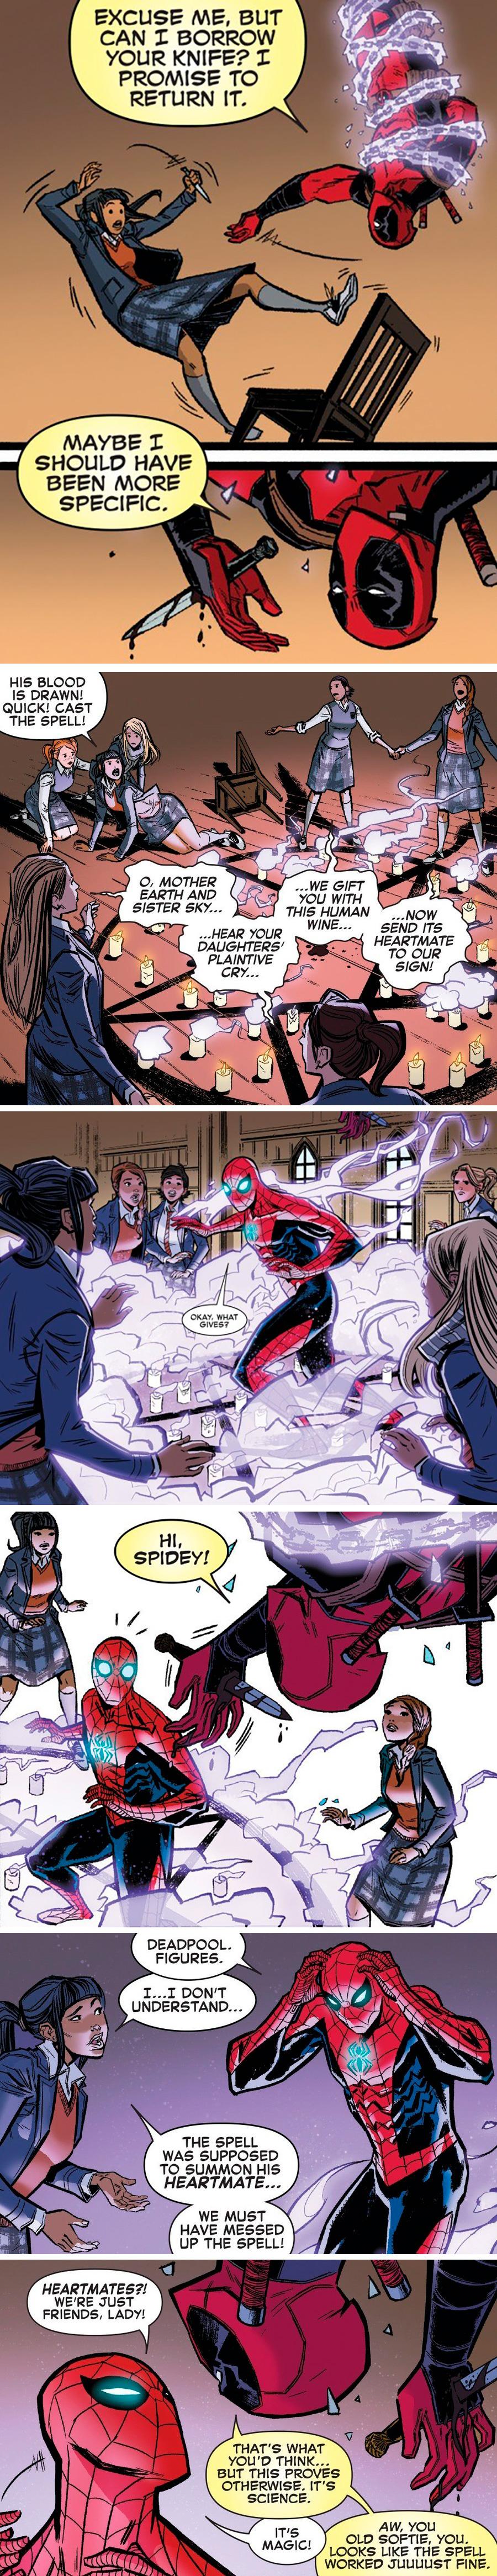 Deadpool and Spiderman: Heartmates